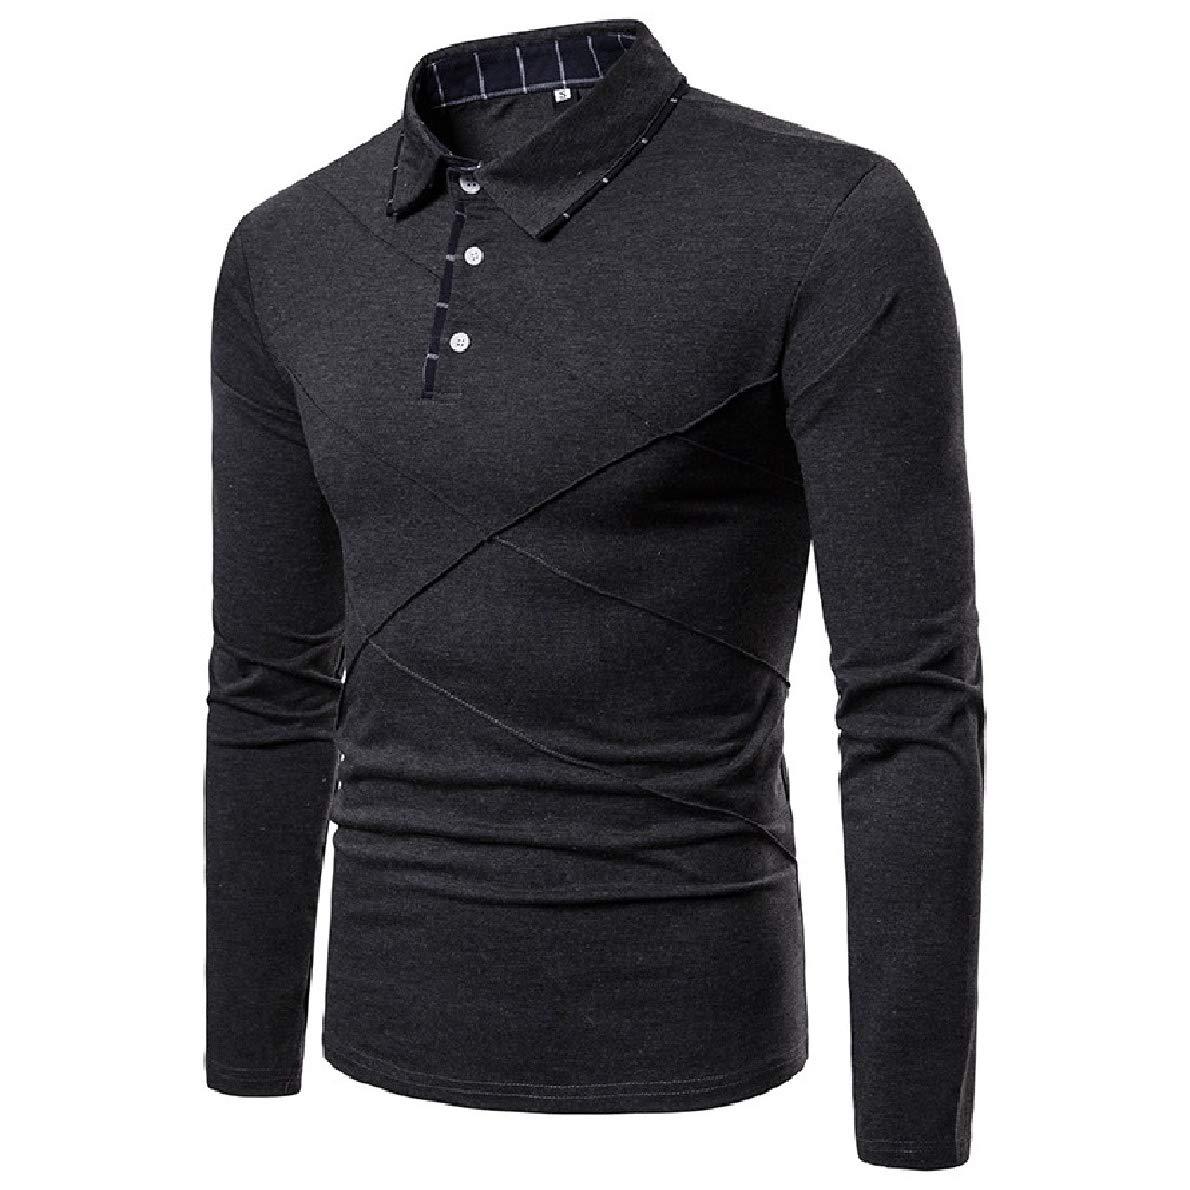 Winwinus Mens Pullover Long-Sleeve Lapel Collar Plus-Size Causal Polo Shirt